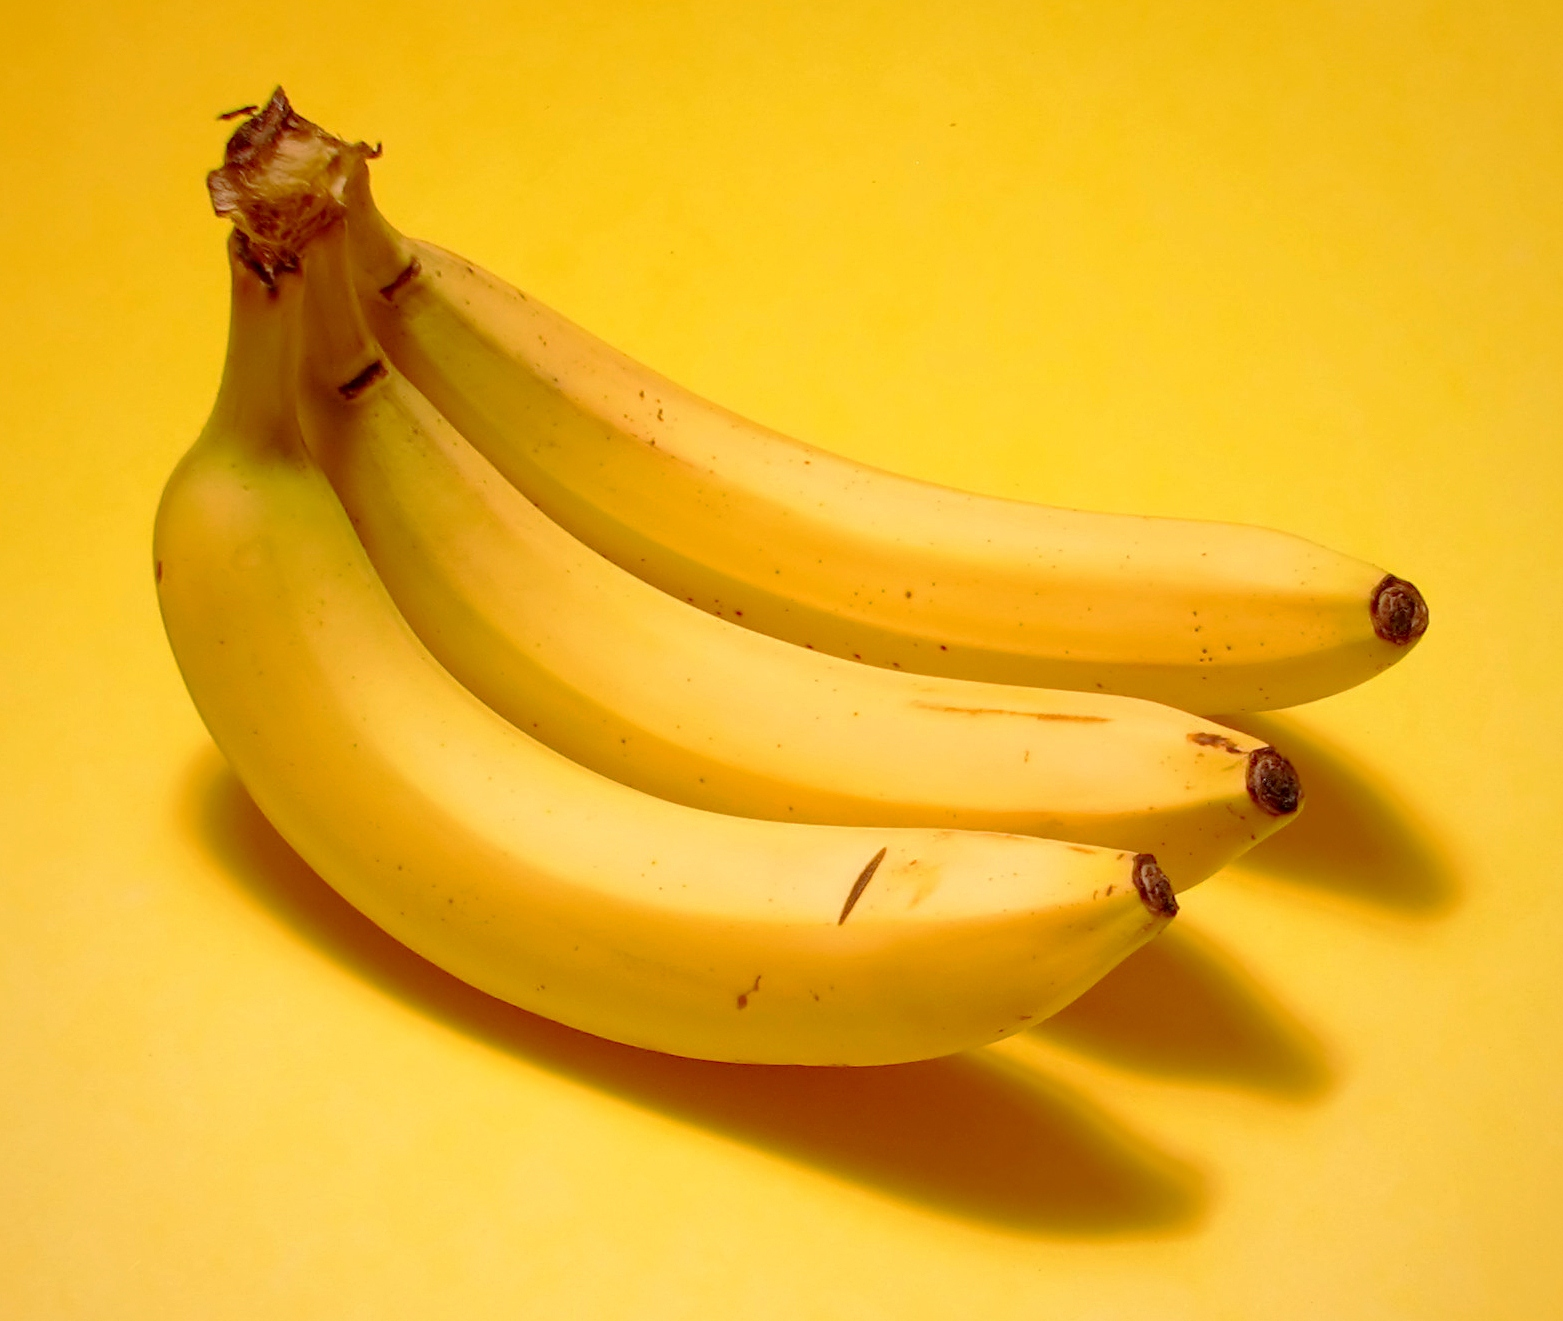 ����3 bananasjpg � ��������